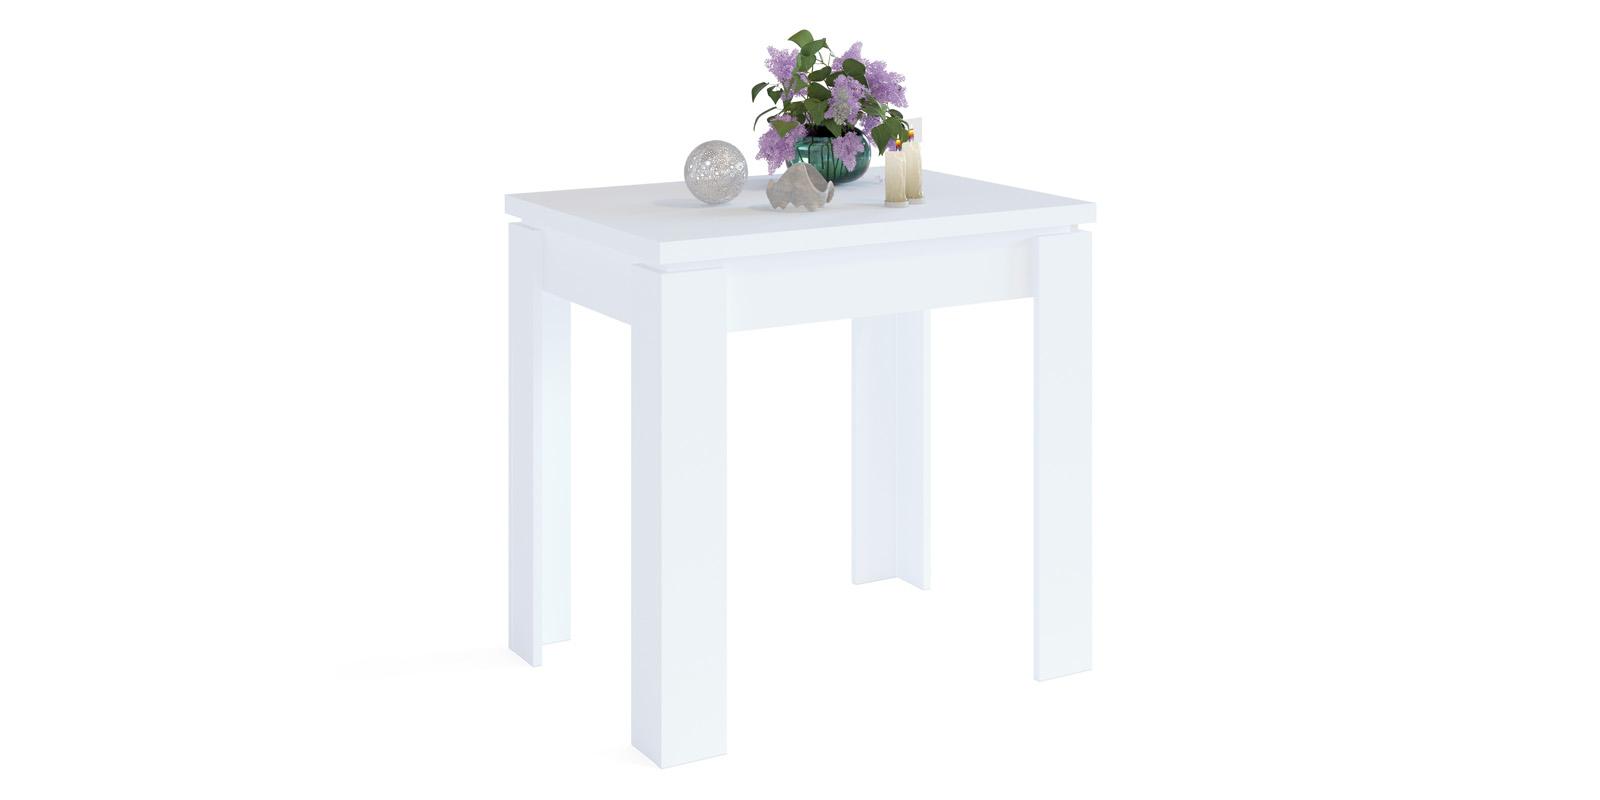 Обеденный стол Лутон вариант №1 (белый)